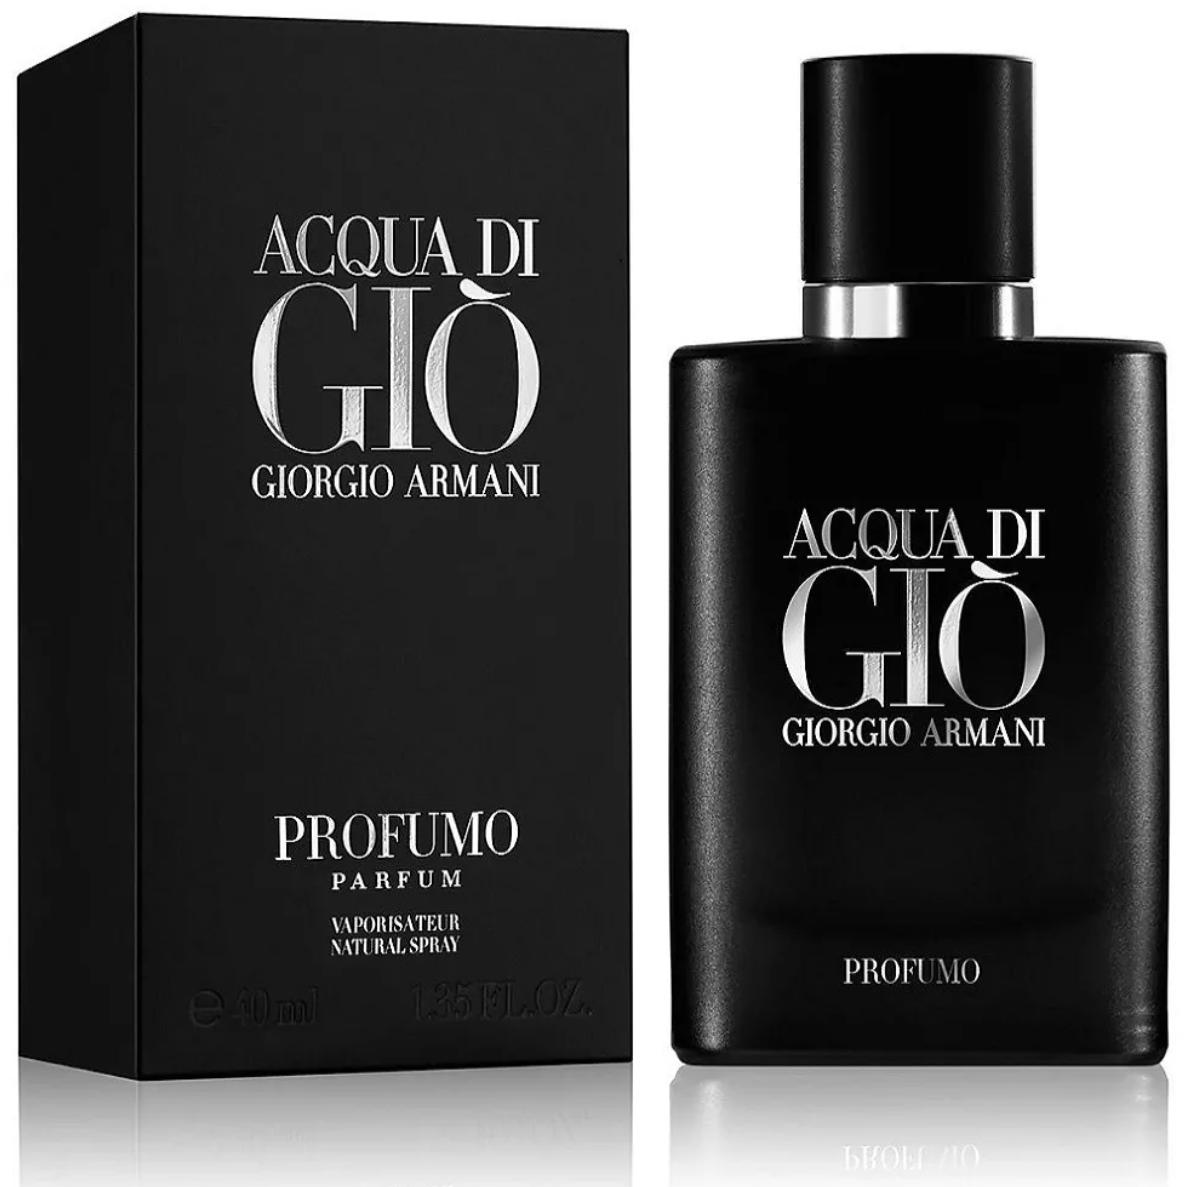 a6c4e5767 Giorgio Armani Acqua di Gio Hommo Profumo - eau de parfum  #perfumesoutletportugal #giorgioarmani #